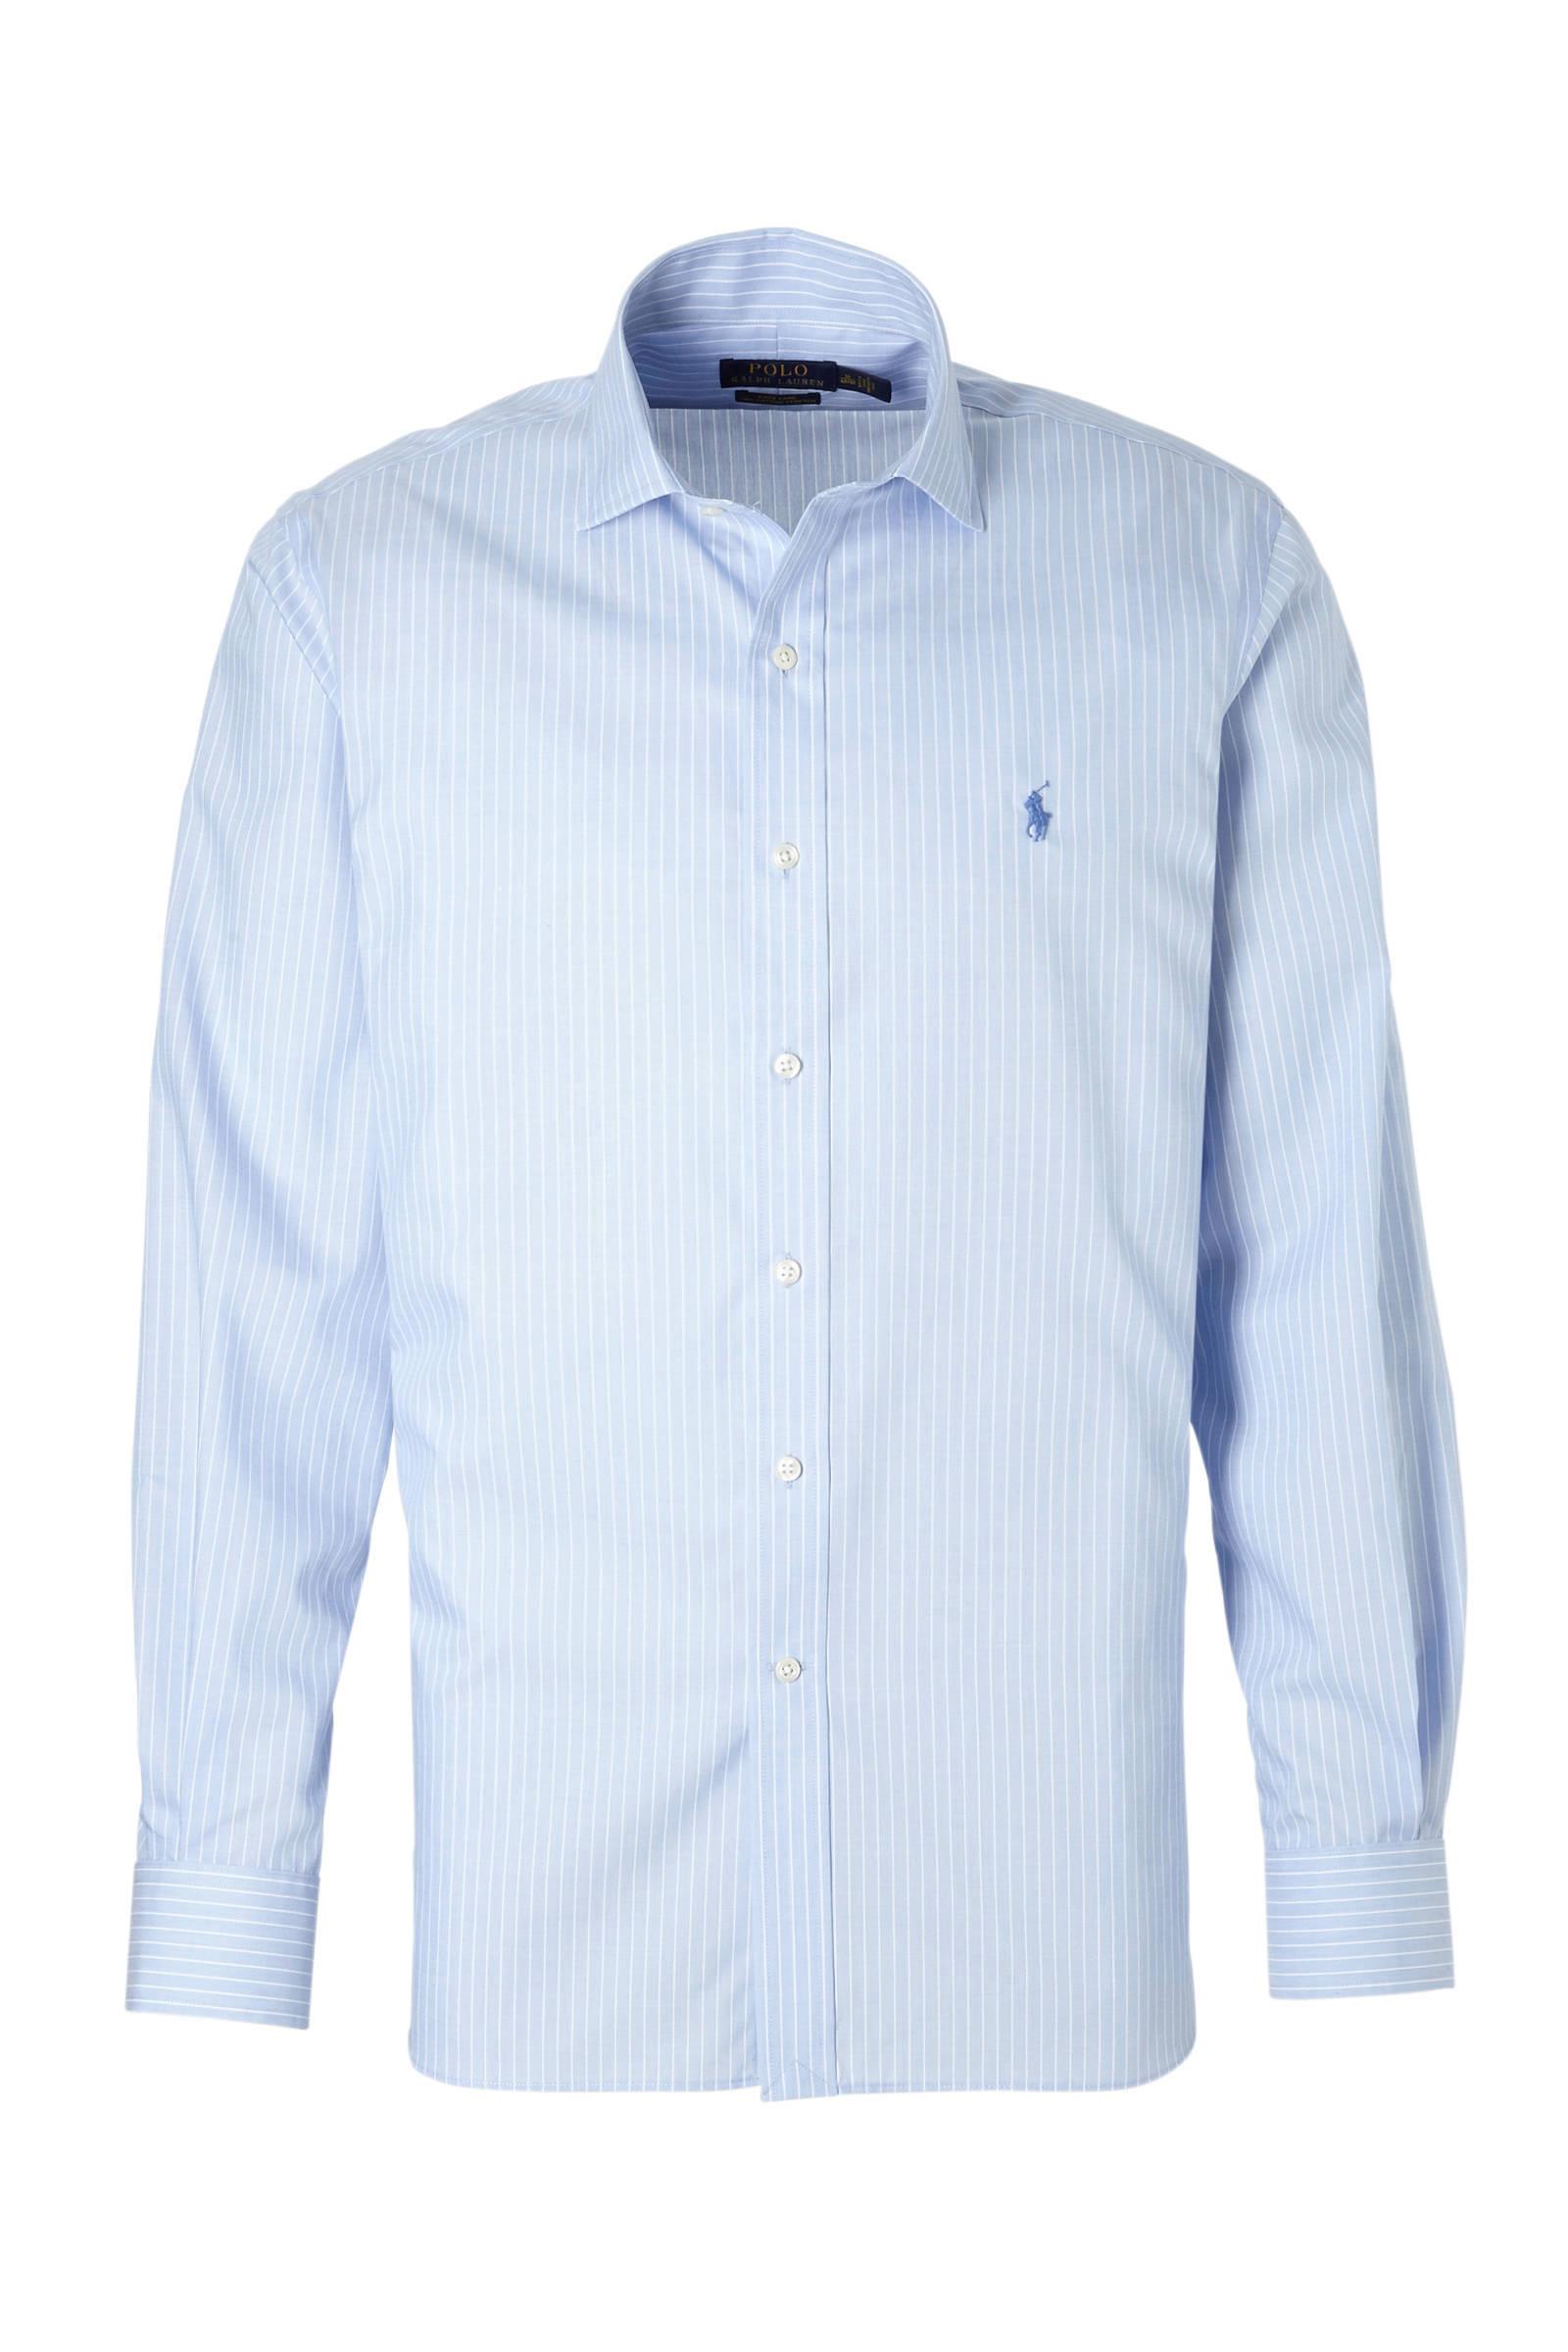 4c869459f366 POLO Ralph Lauren slim fit overhemd   wehkamp